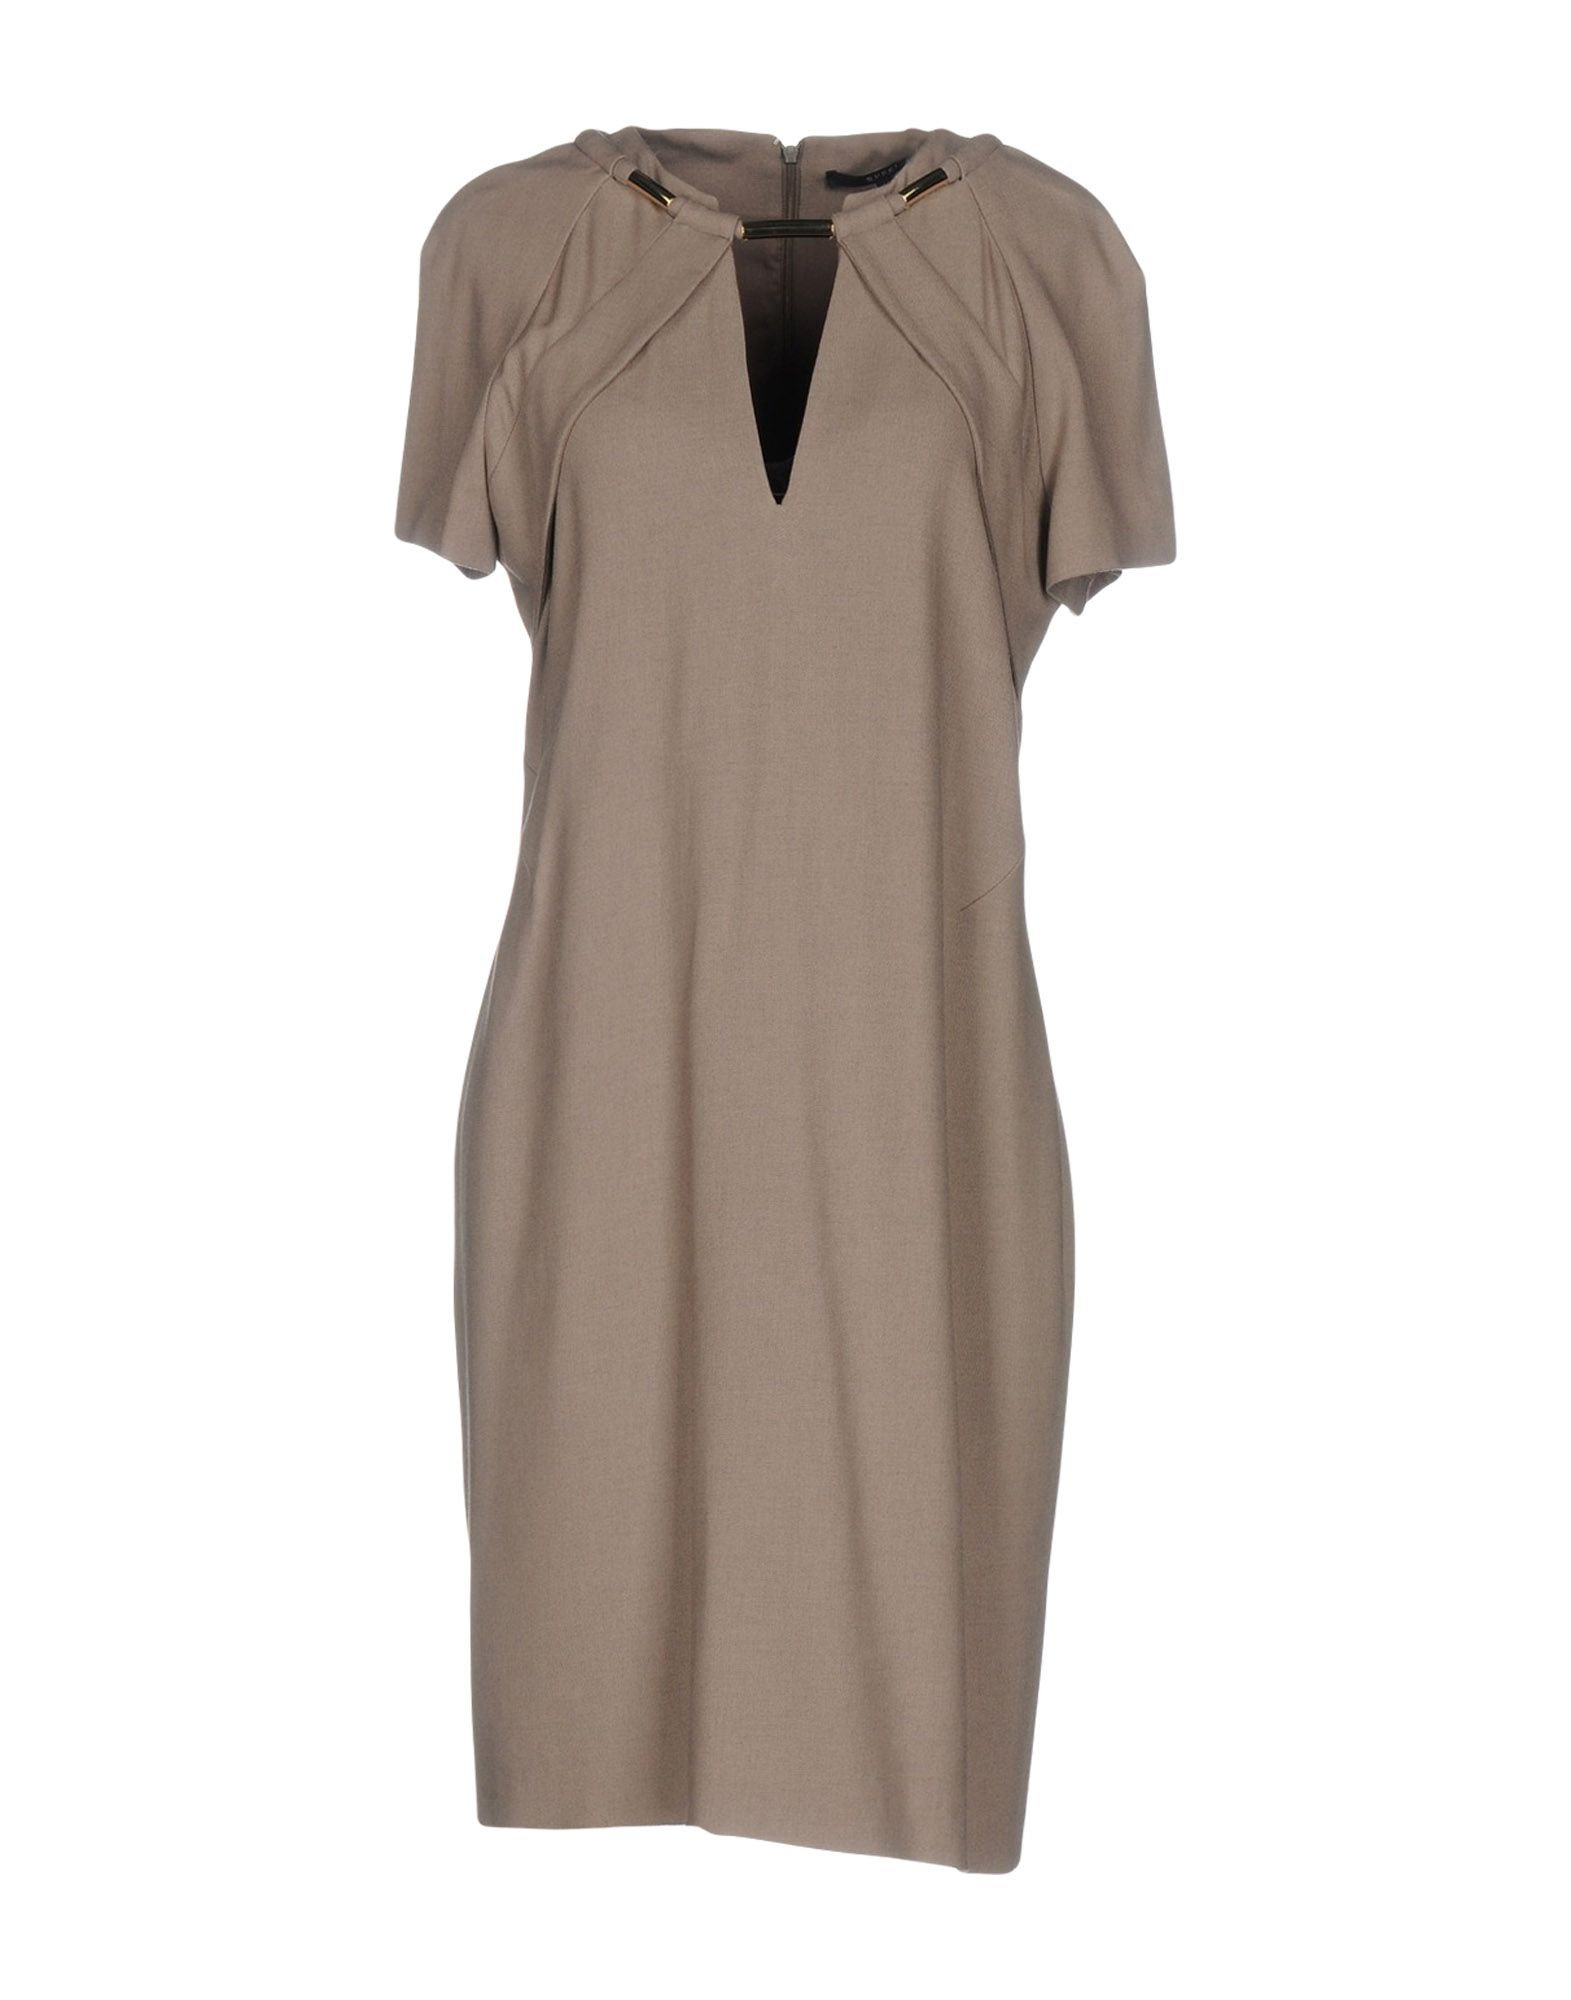 GUCCI Damen Kurzes Kleid Farbe Khaki Größe 6